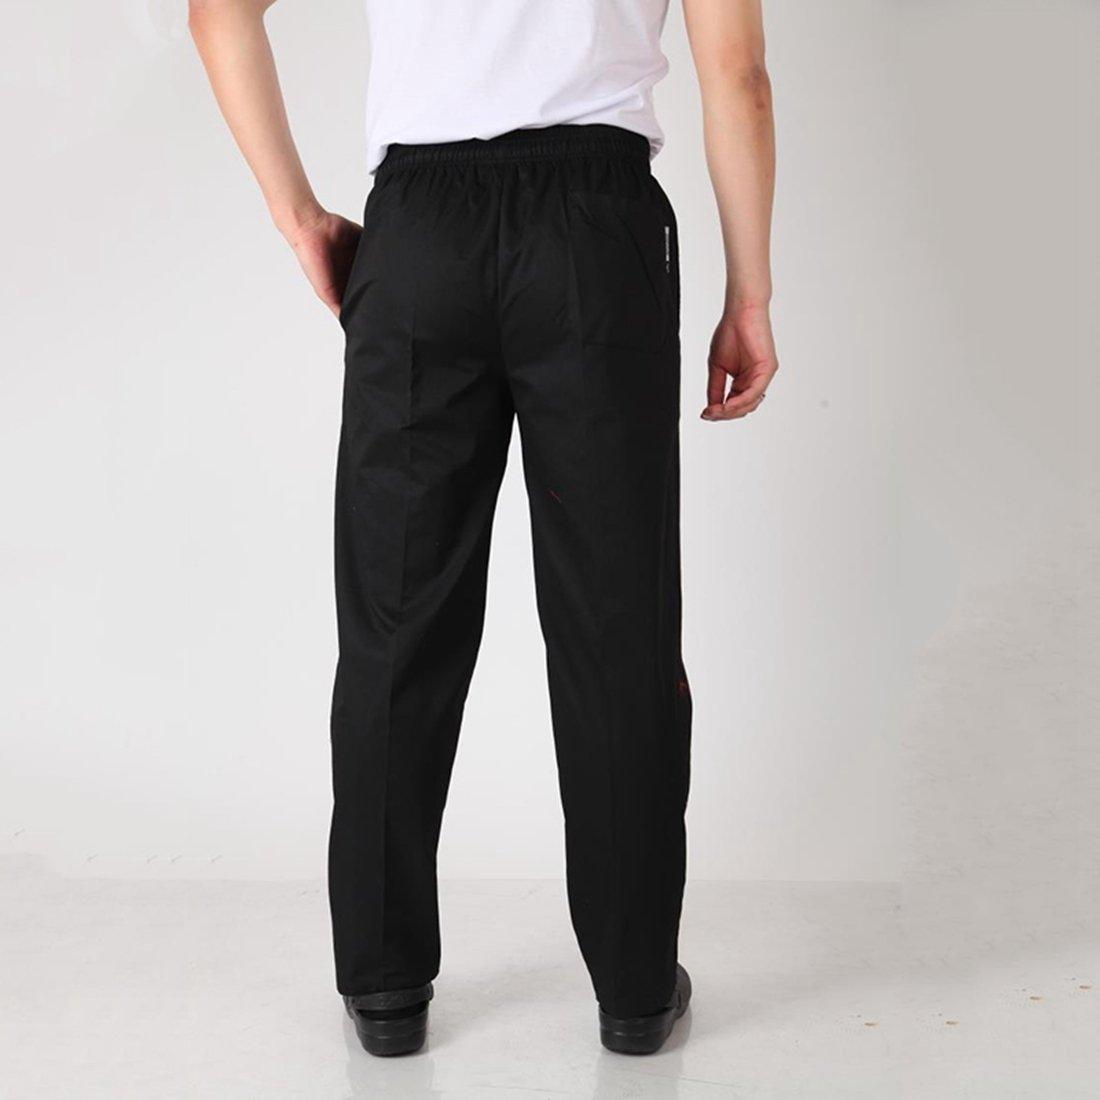 Enerhu Men Elastic Waist Baggy Chef Pants Pockets Hotel/Kitchen/Restaurant/Coffee Uniform Pants Asian M by Enerhu (Image #4)